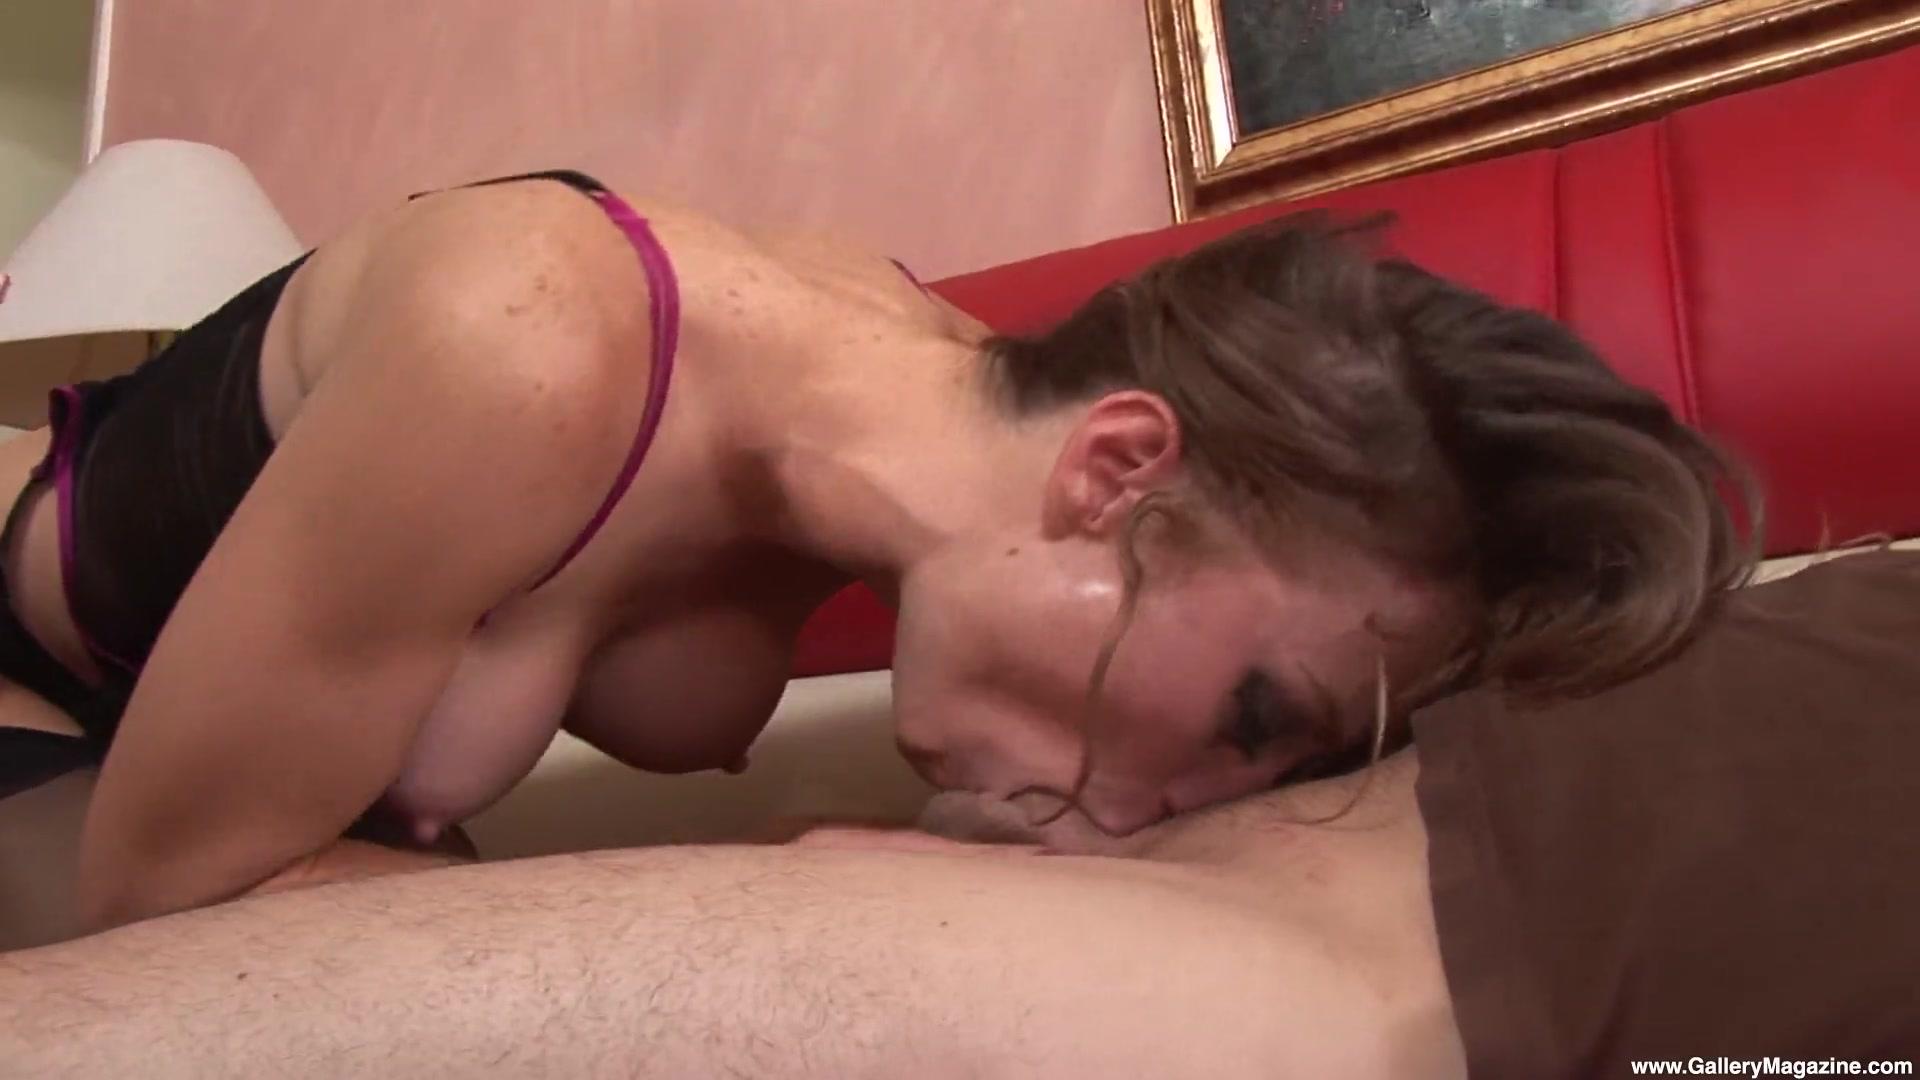 Porn archive Free nick moretti gay porn videos